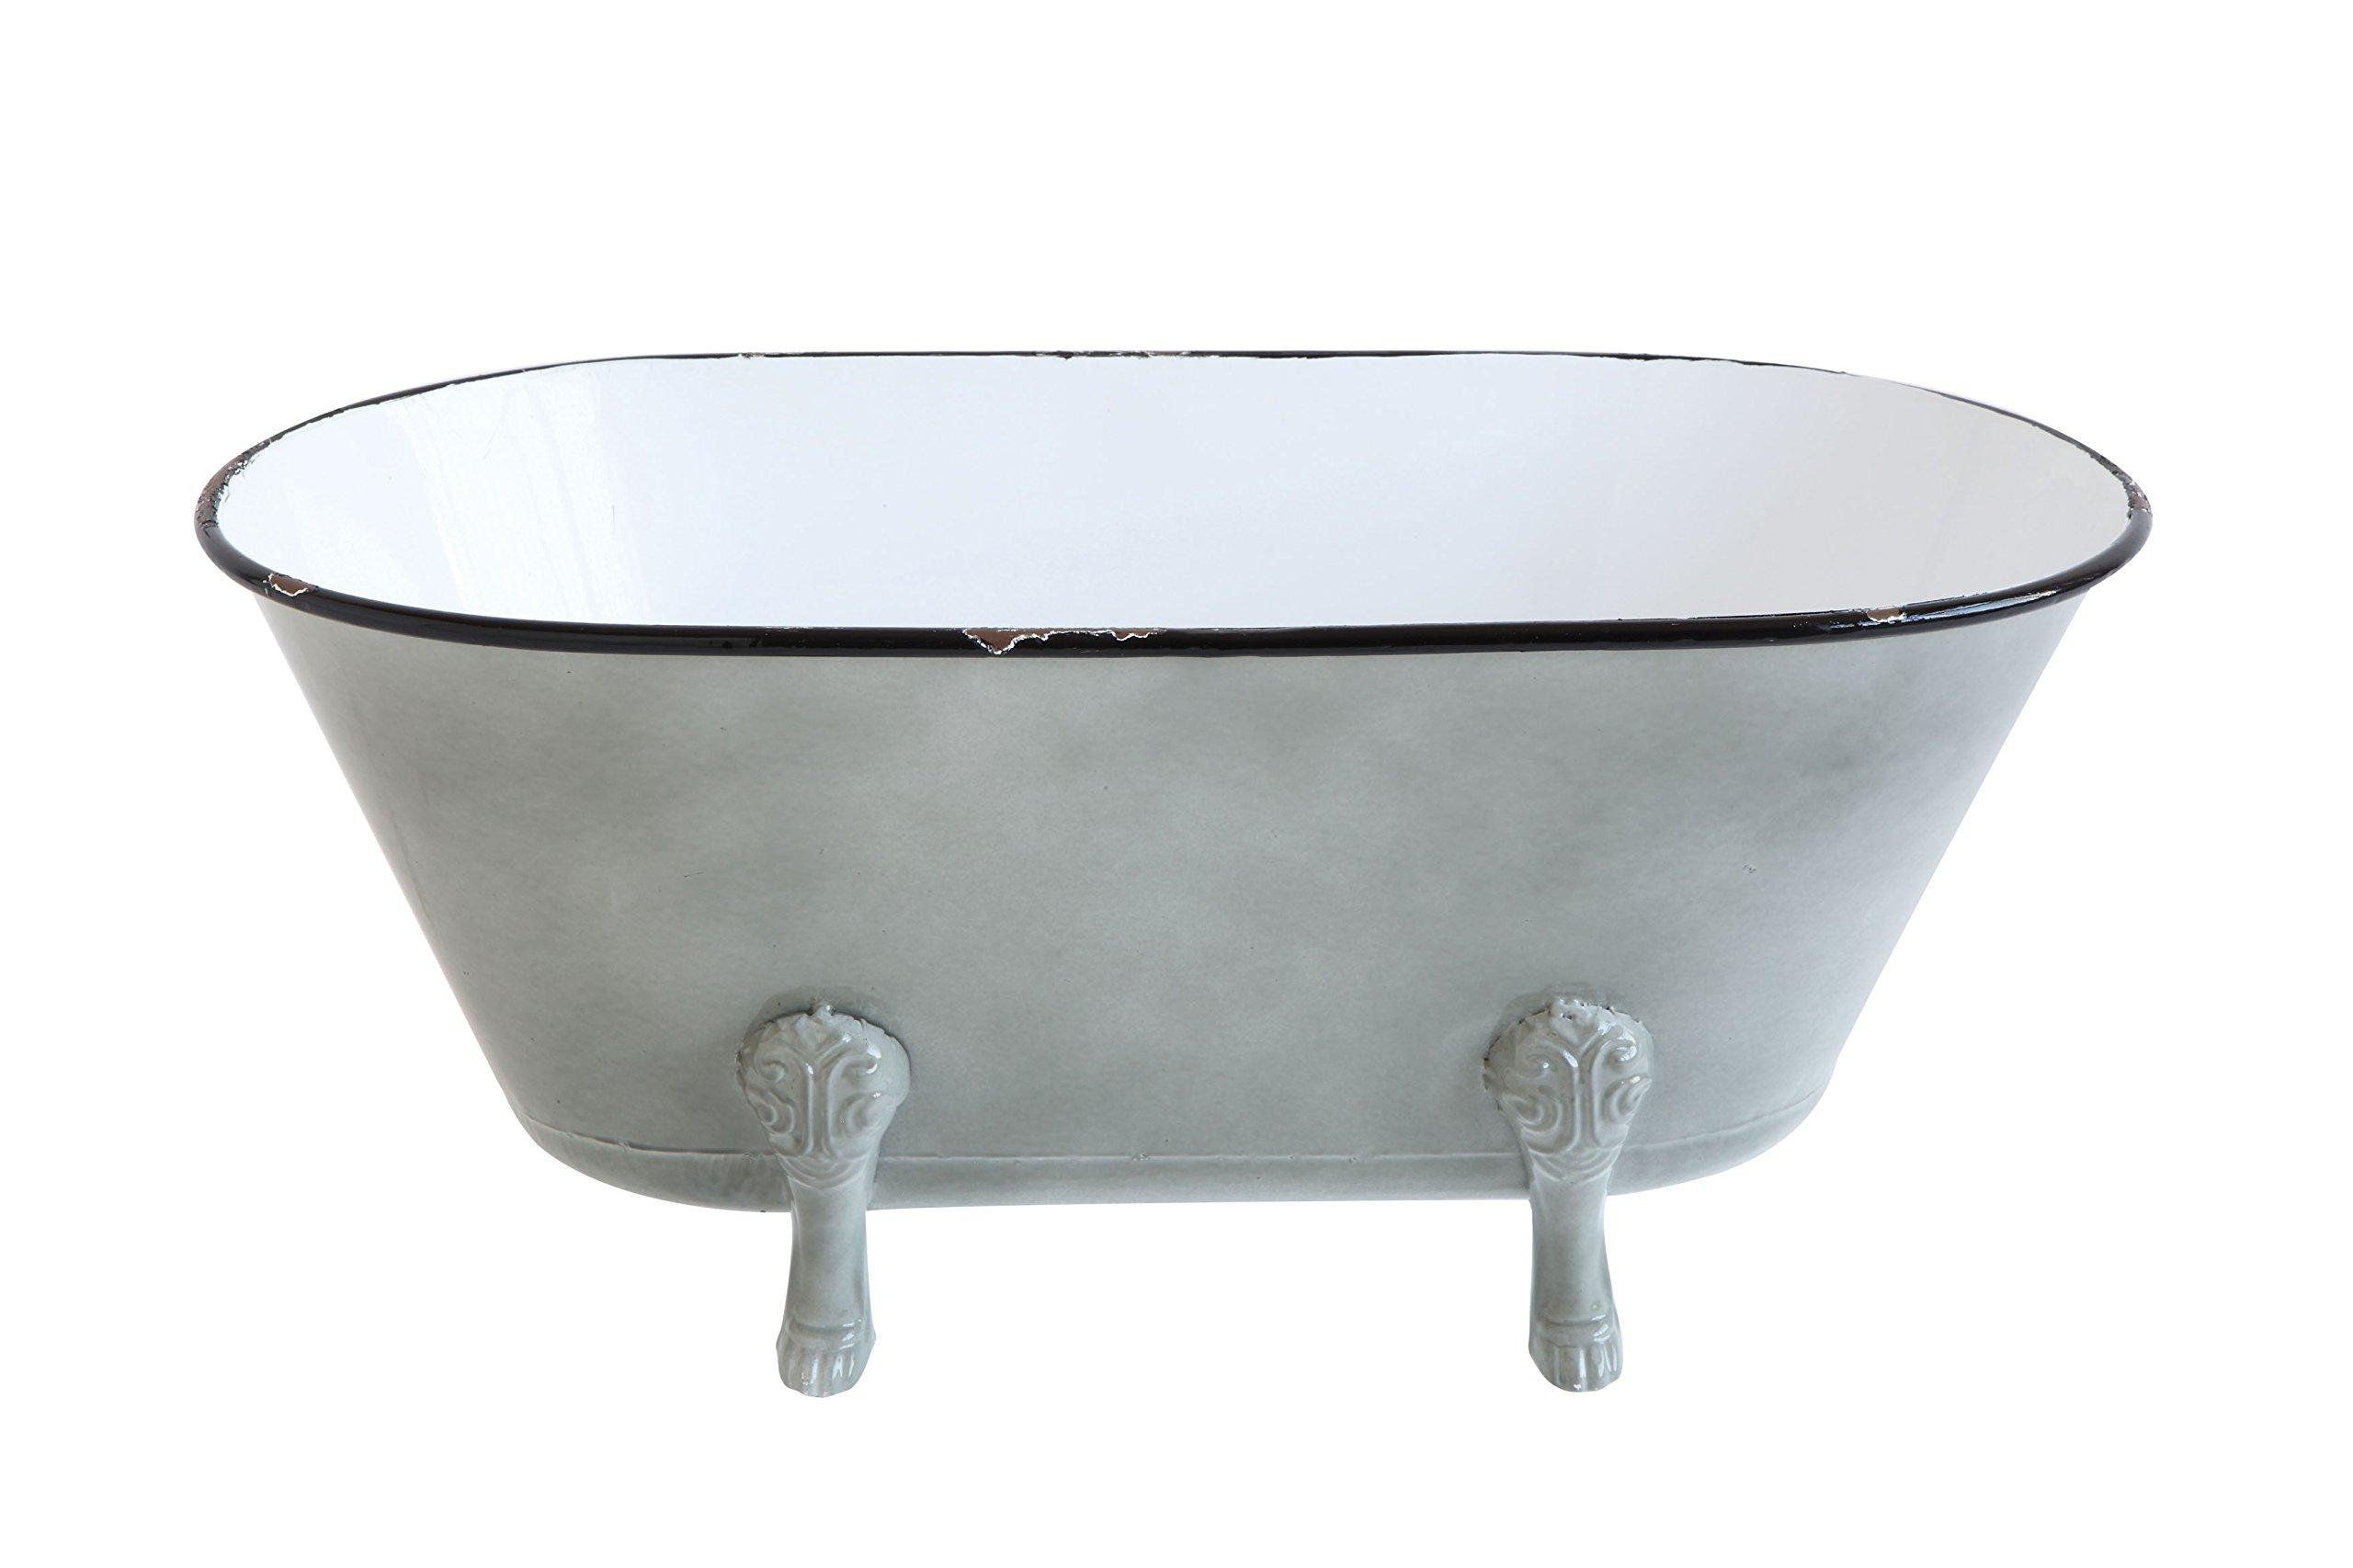 Creative Co-Op DA9178 Decorative Metal Bathtub Container with Feet